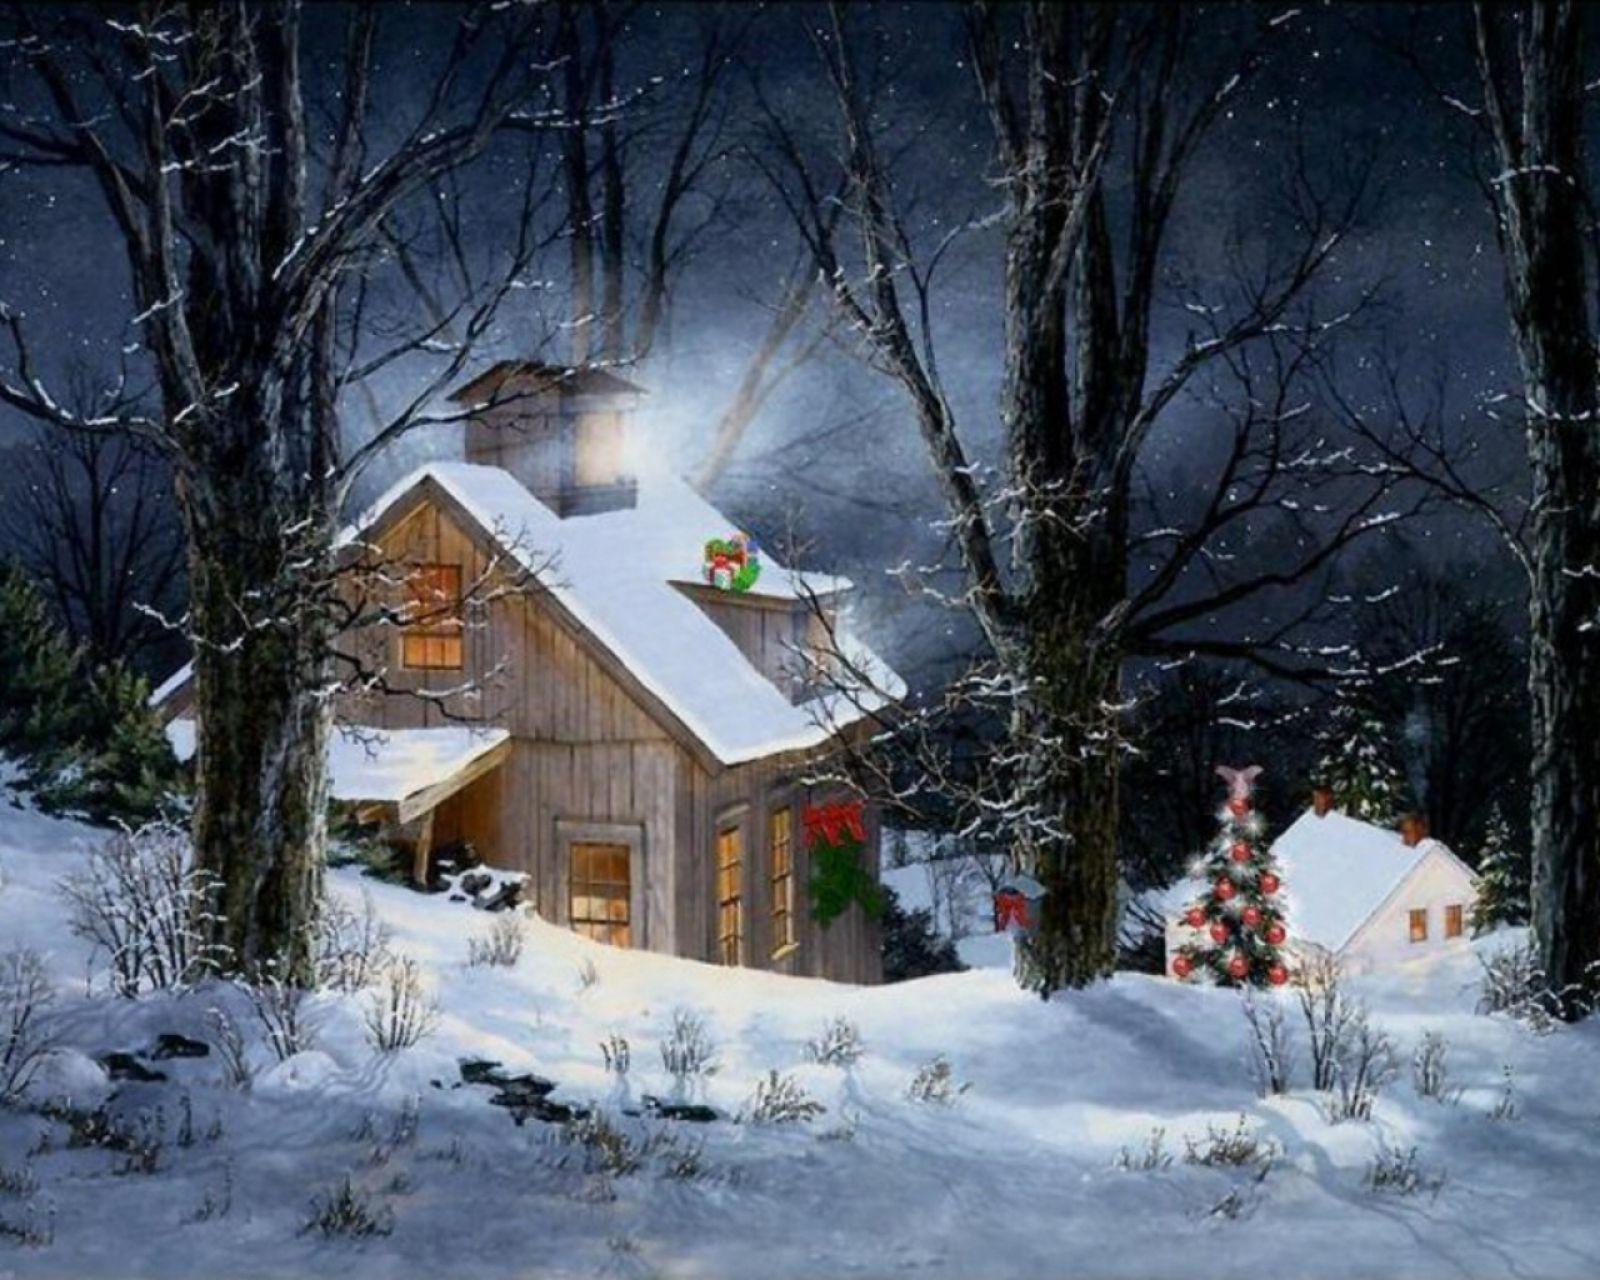 Foto de Paisajes de Navidad Imagen de Paisajes de Navidad Gigante 1600x1280